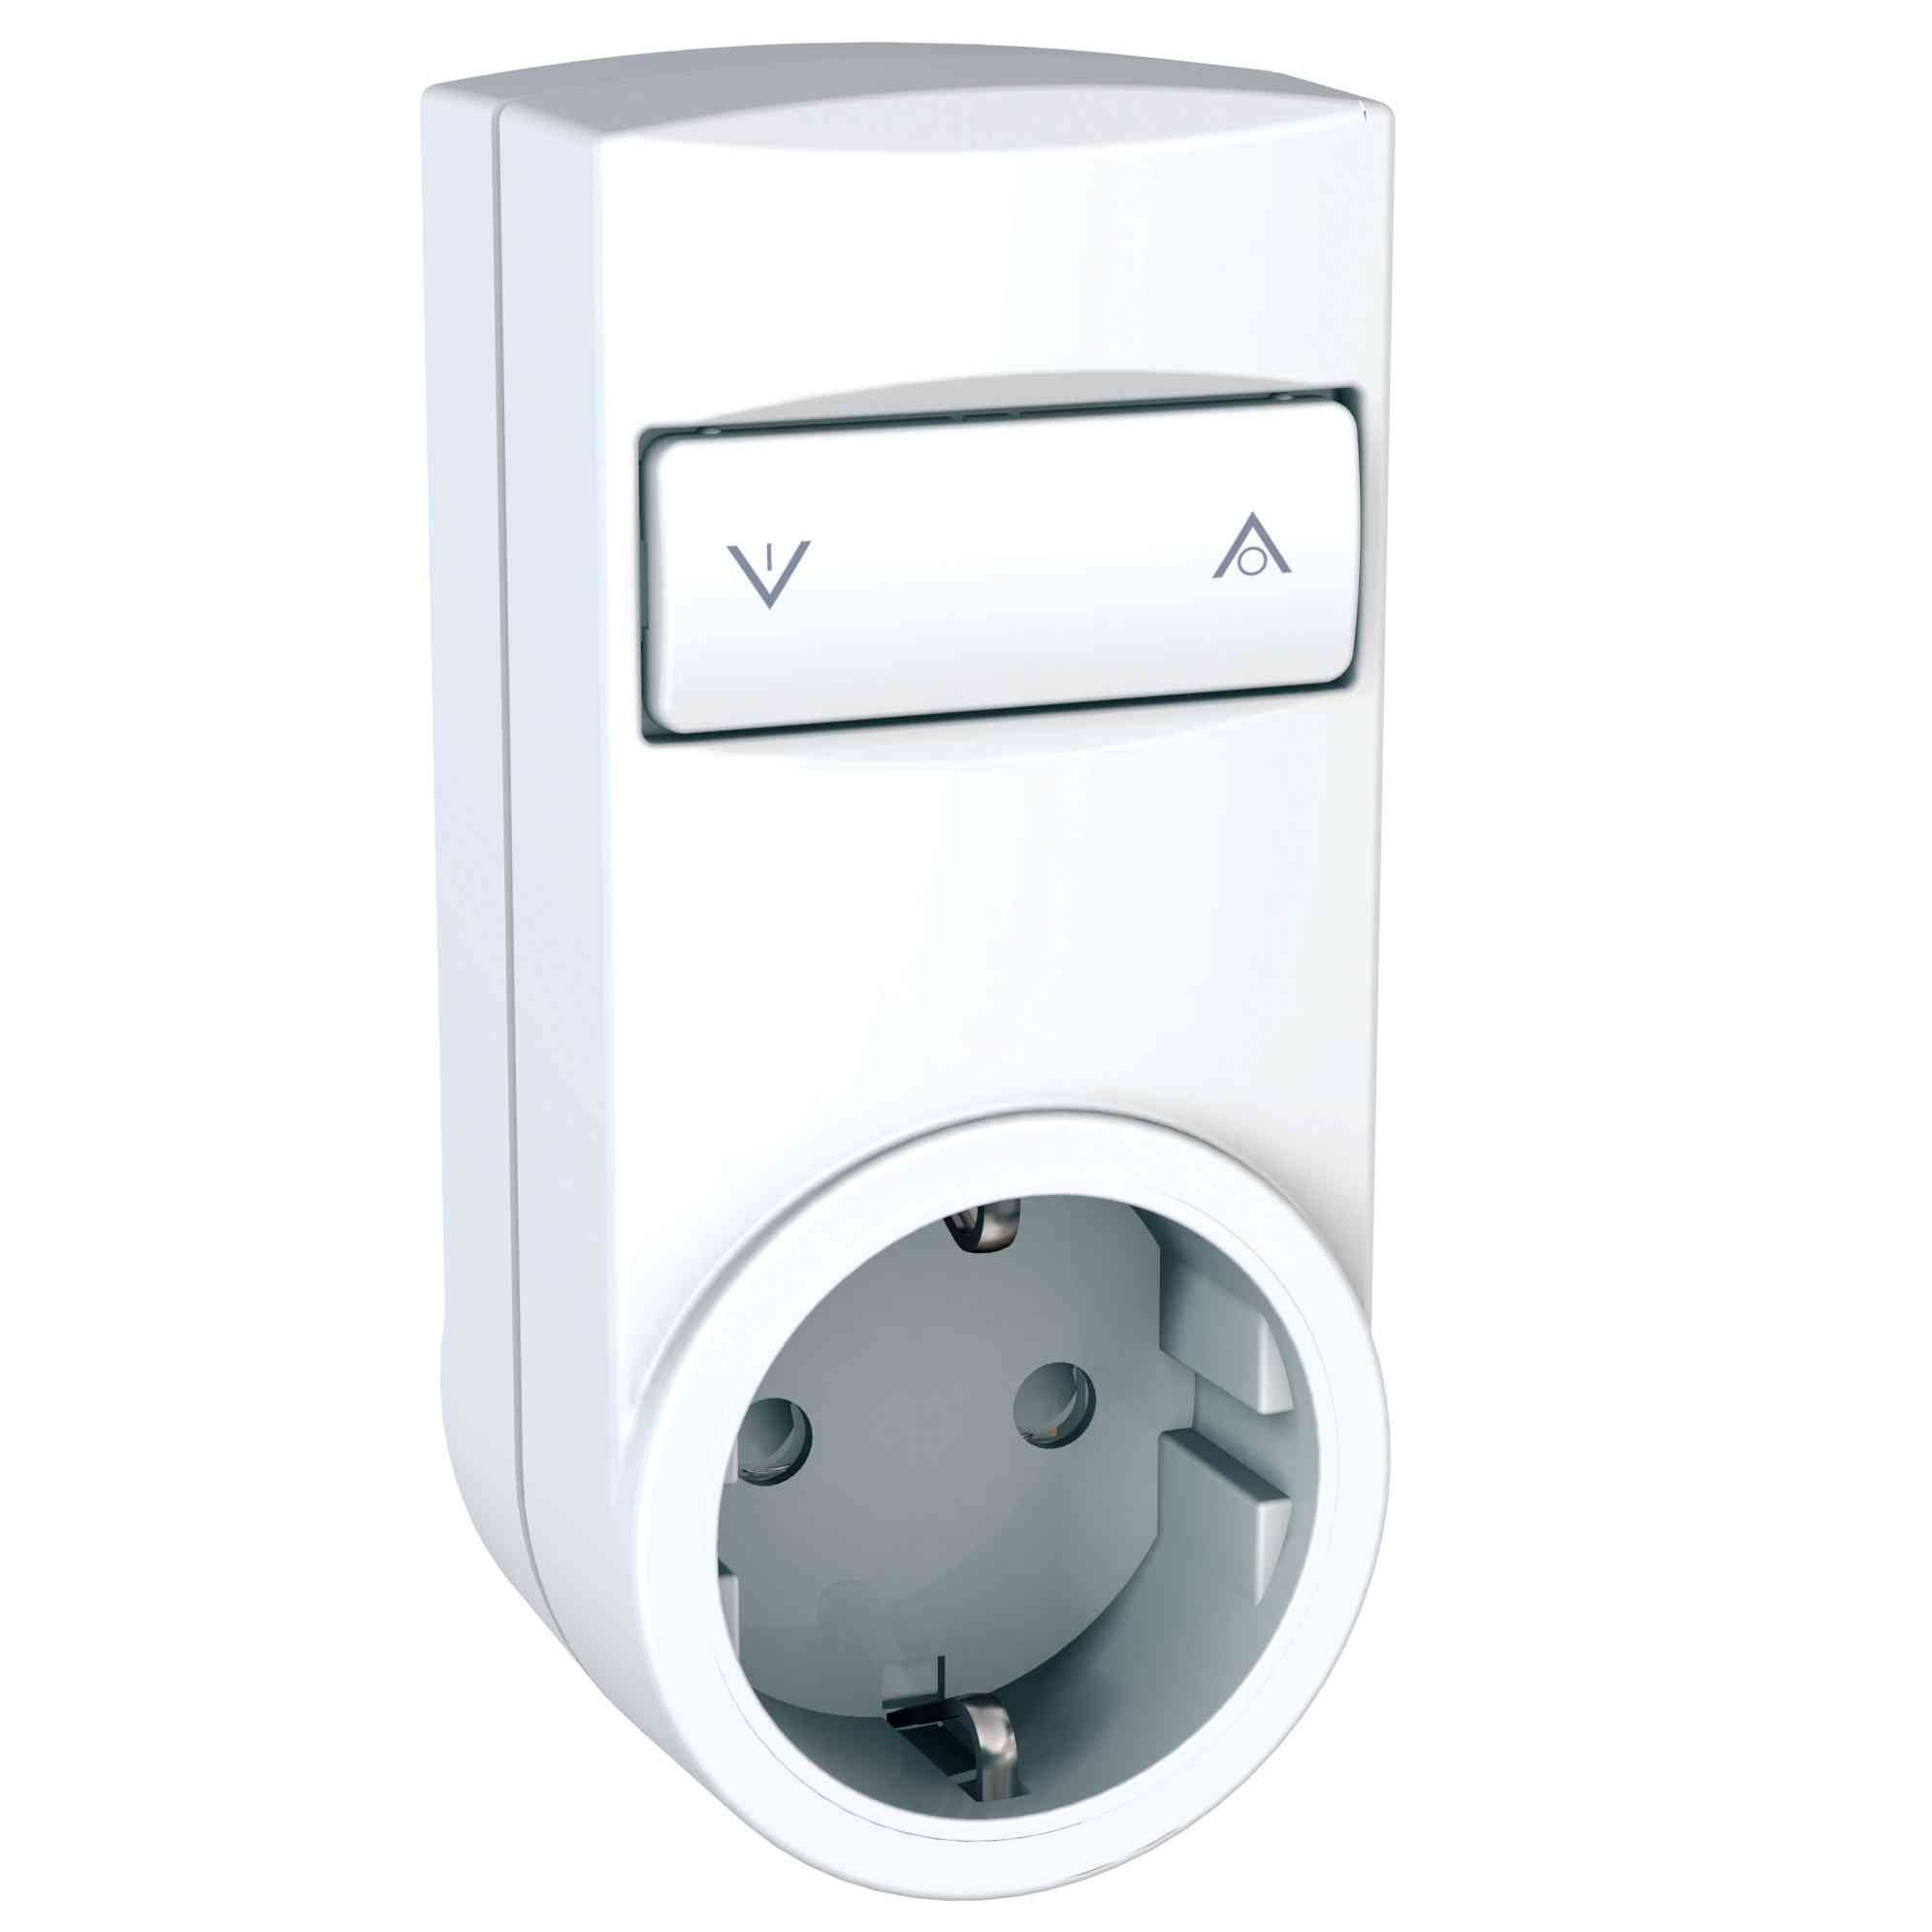 Odace/Unica Wireless - mobilni zatemnilnik z vtičnico - 2P+E, DE - 230 VAC - bel